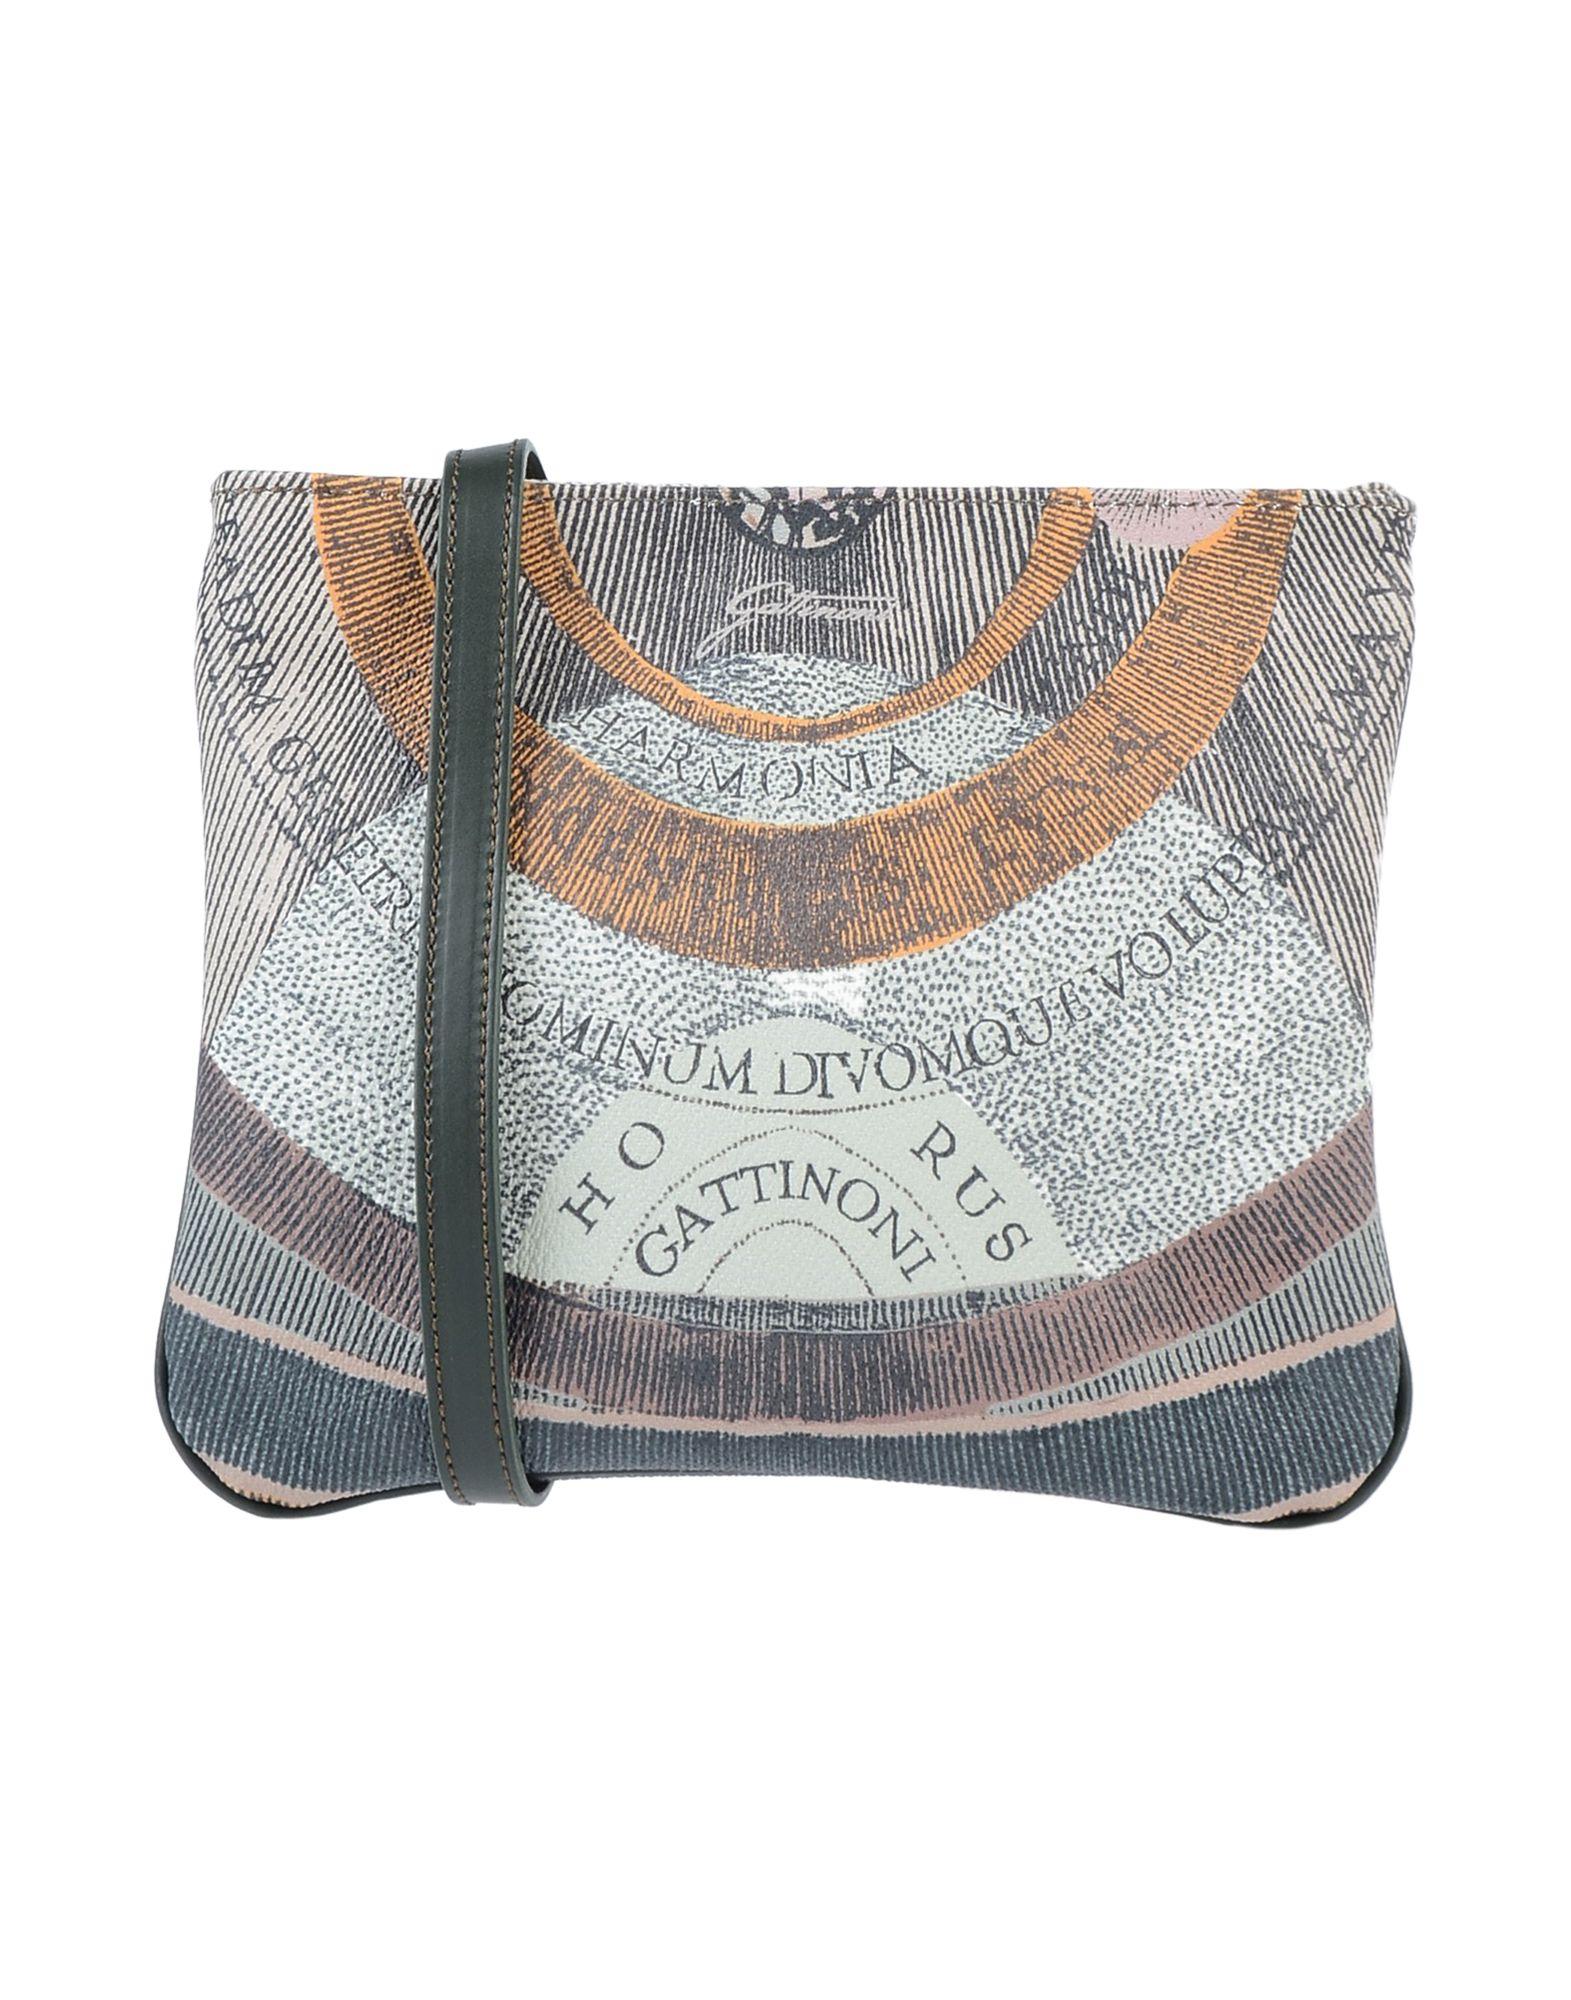 GATTINONI Сумка через плечо momo design сумка через плечо